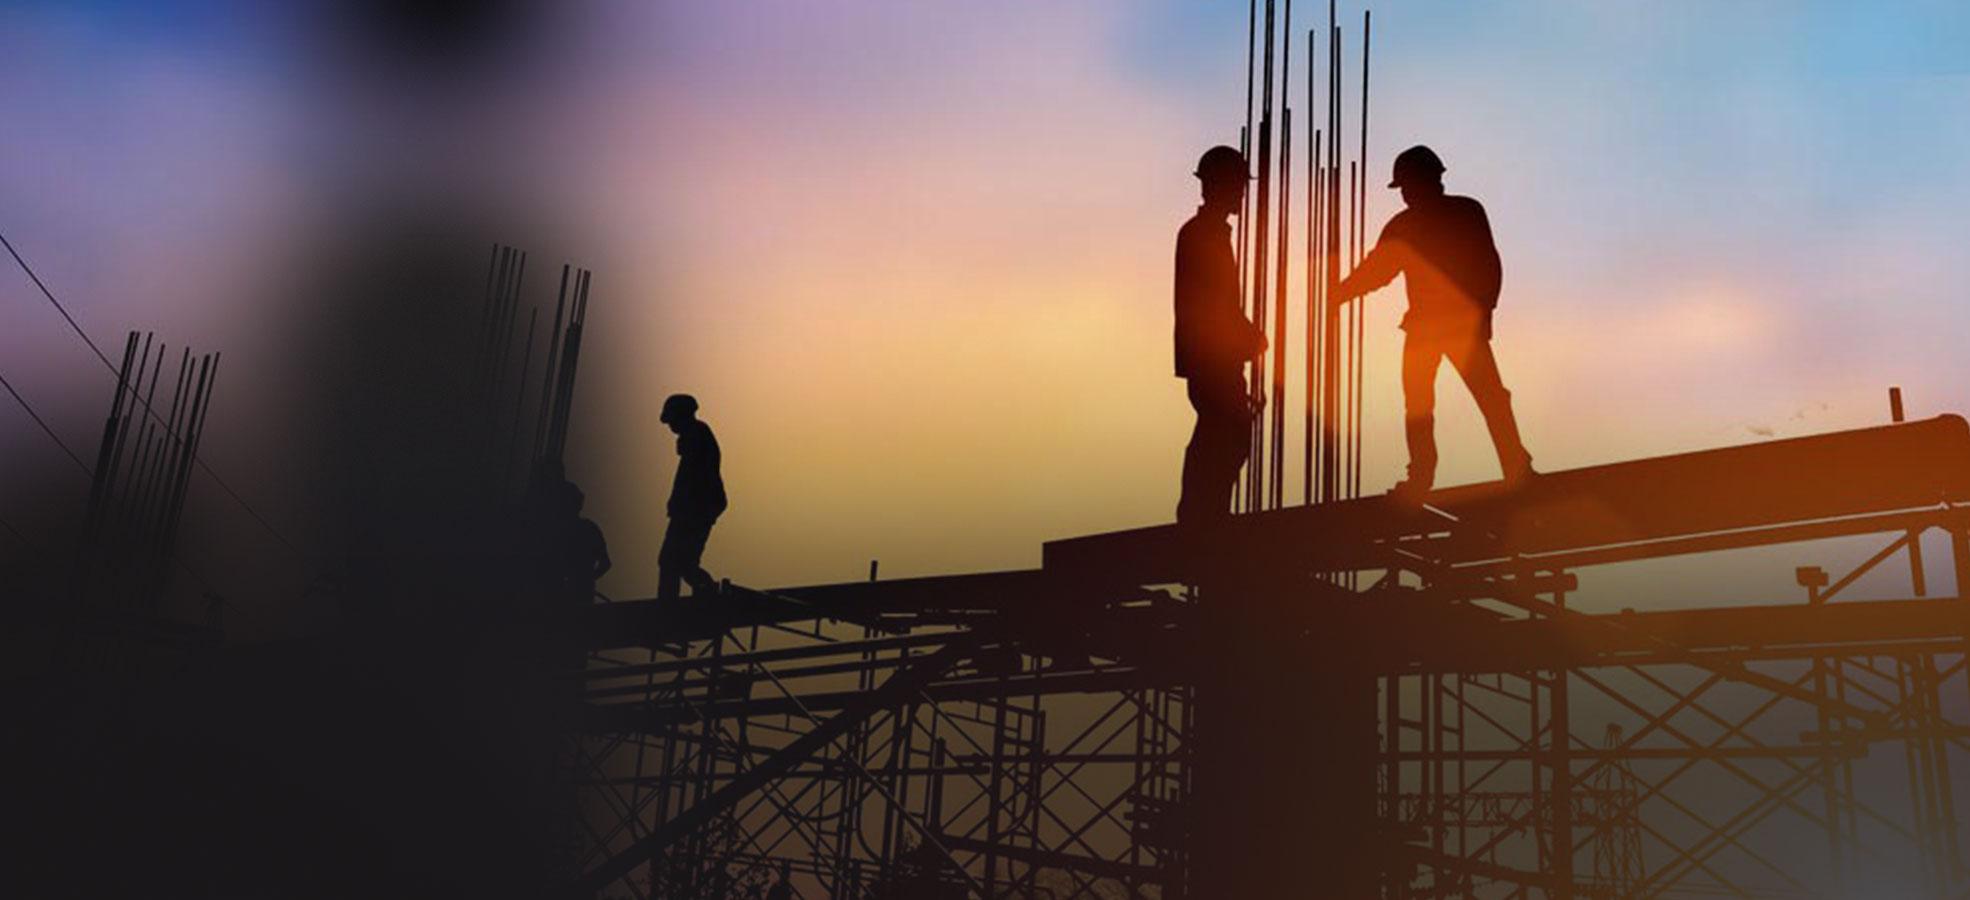 Lagom construction